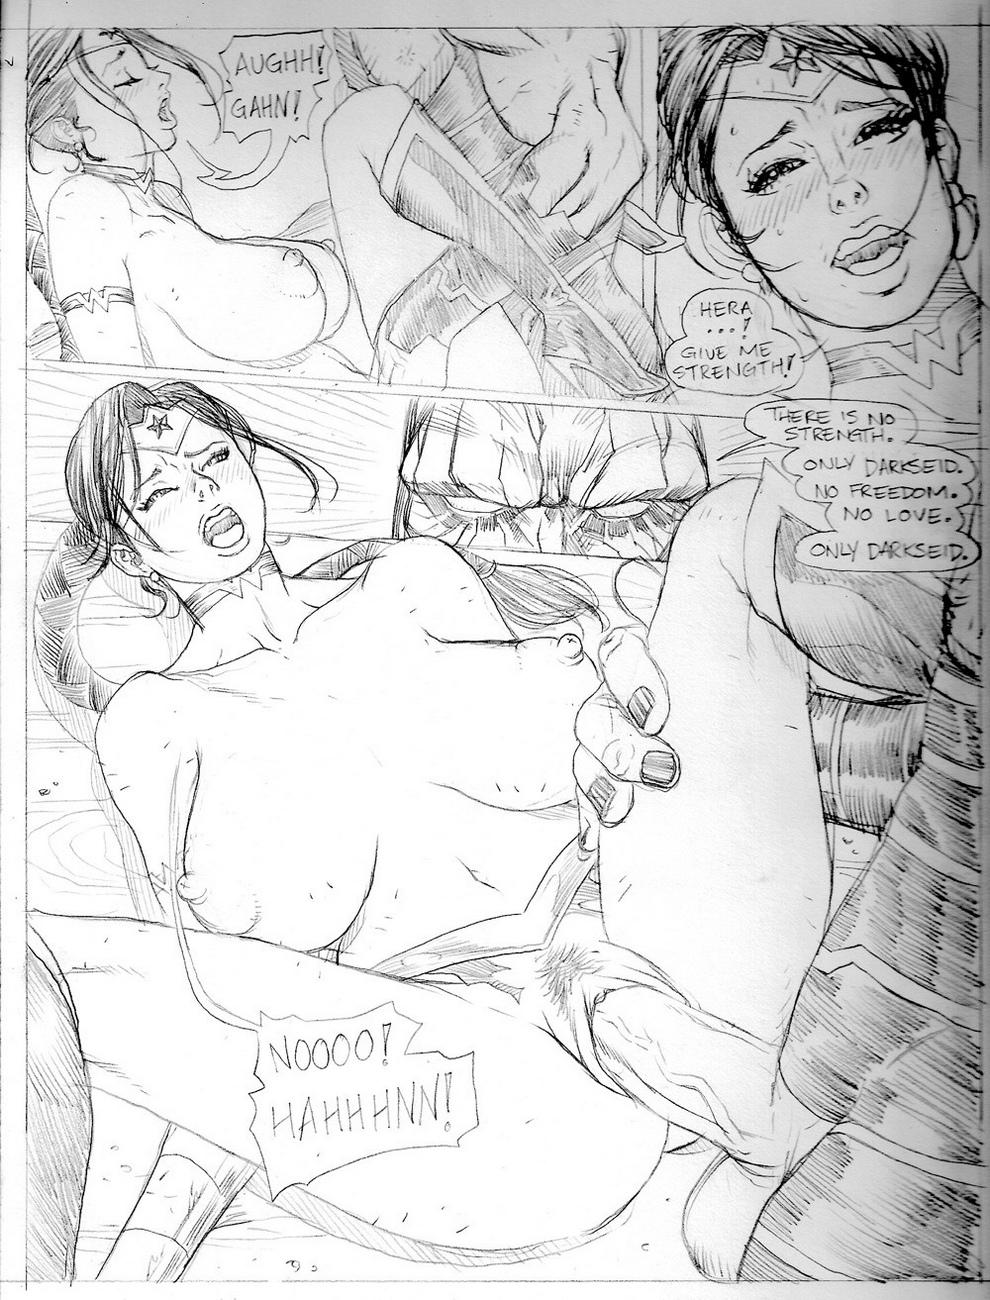 Whores-Of-Darkseid-1-Wonder-Woman 13 free sex comic